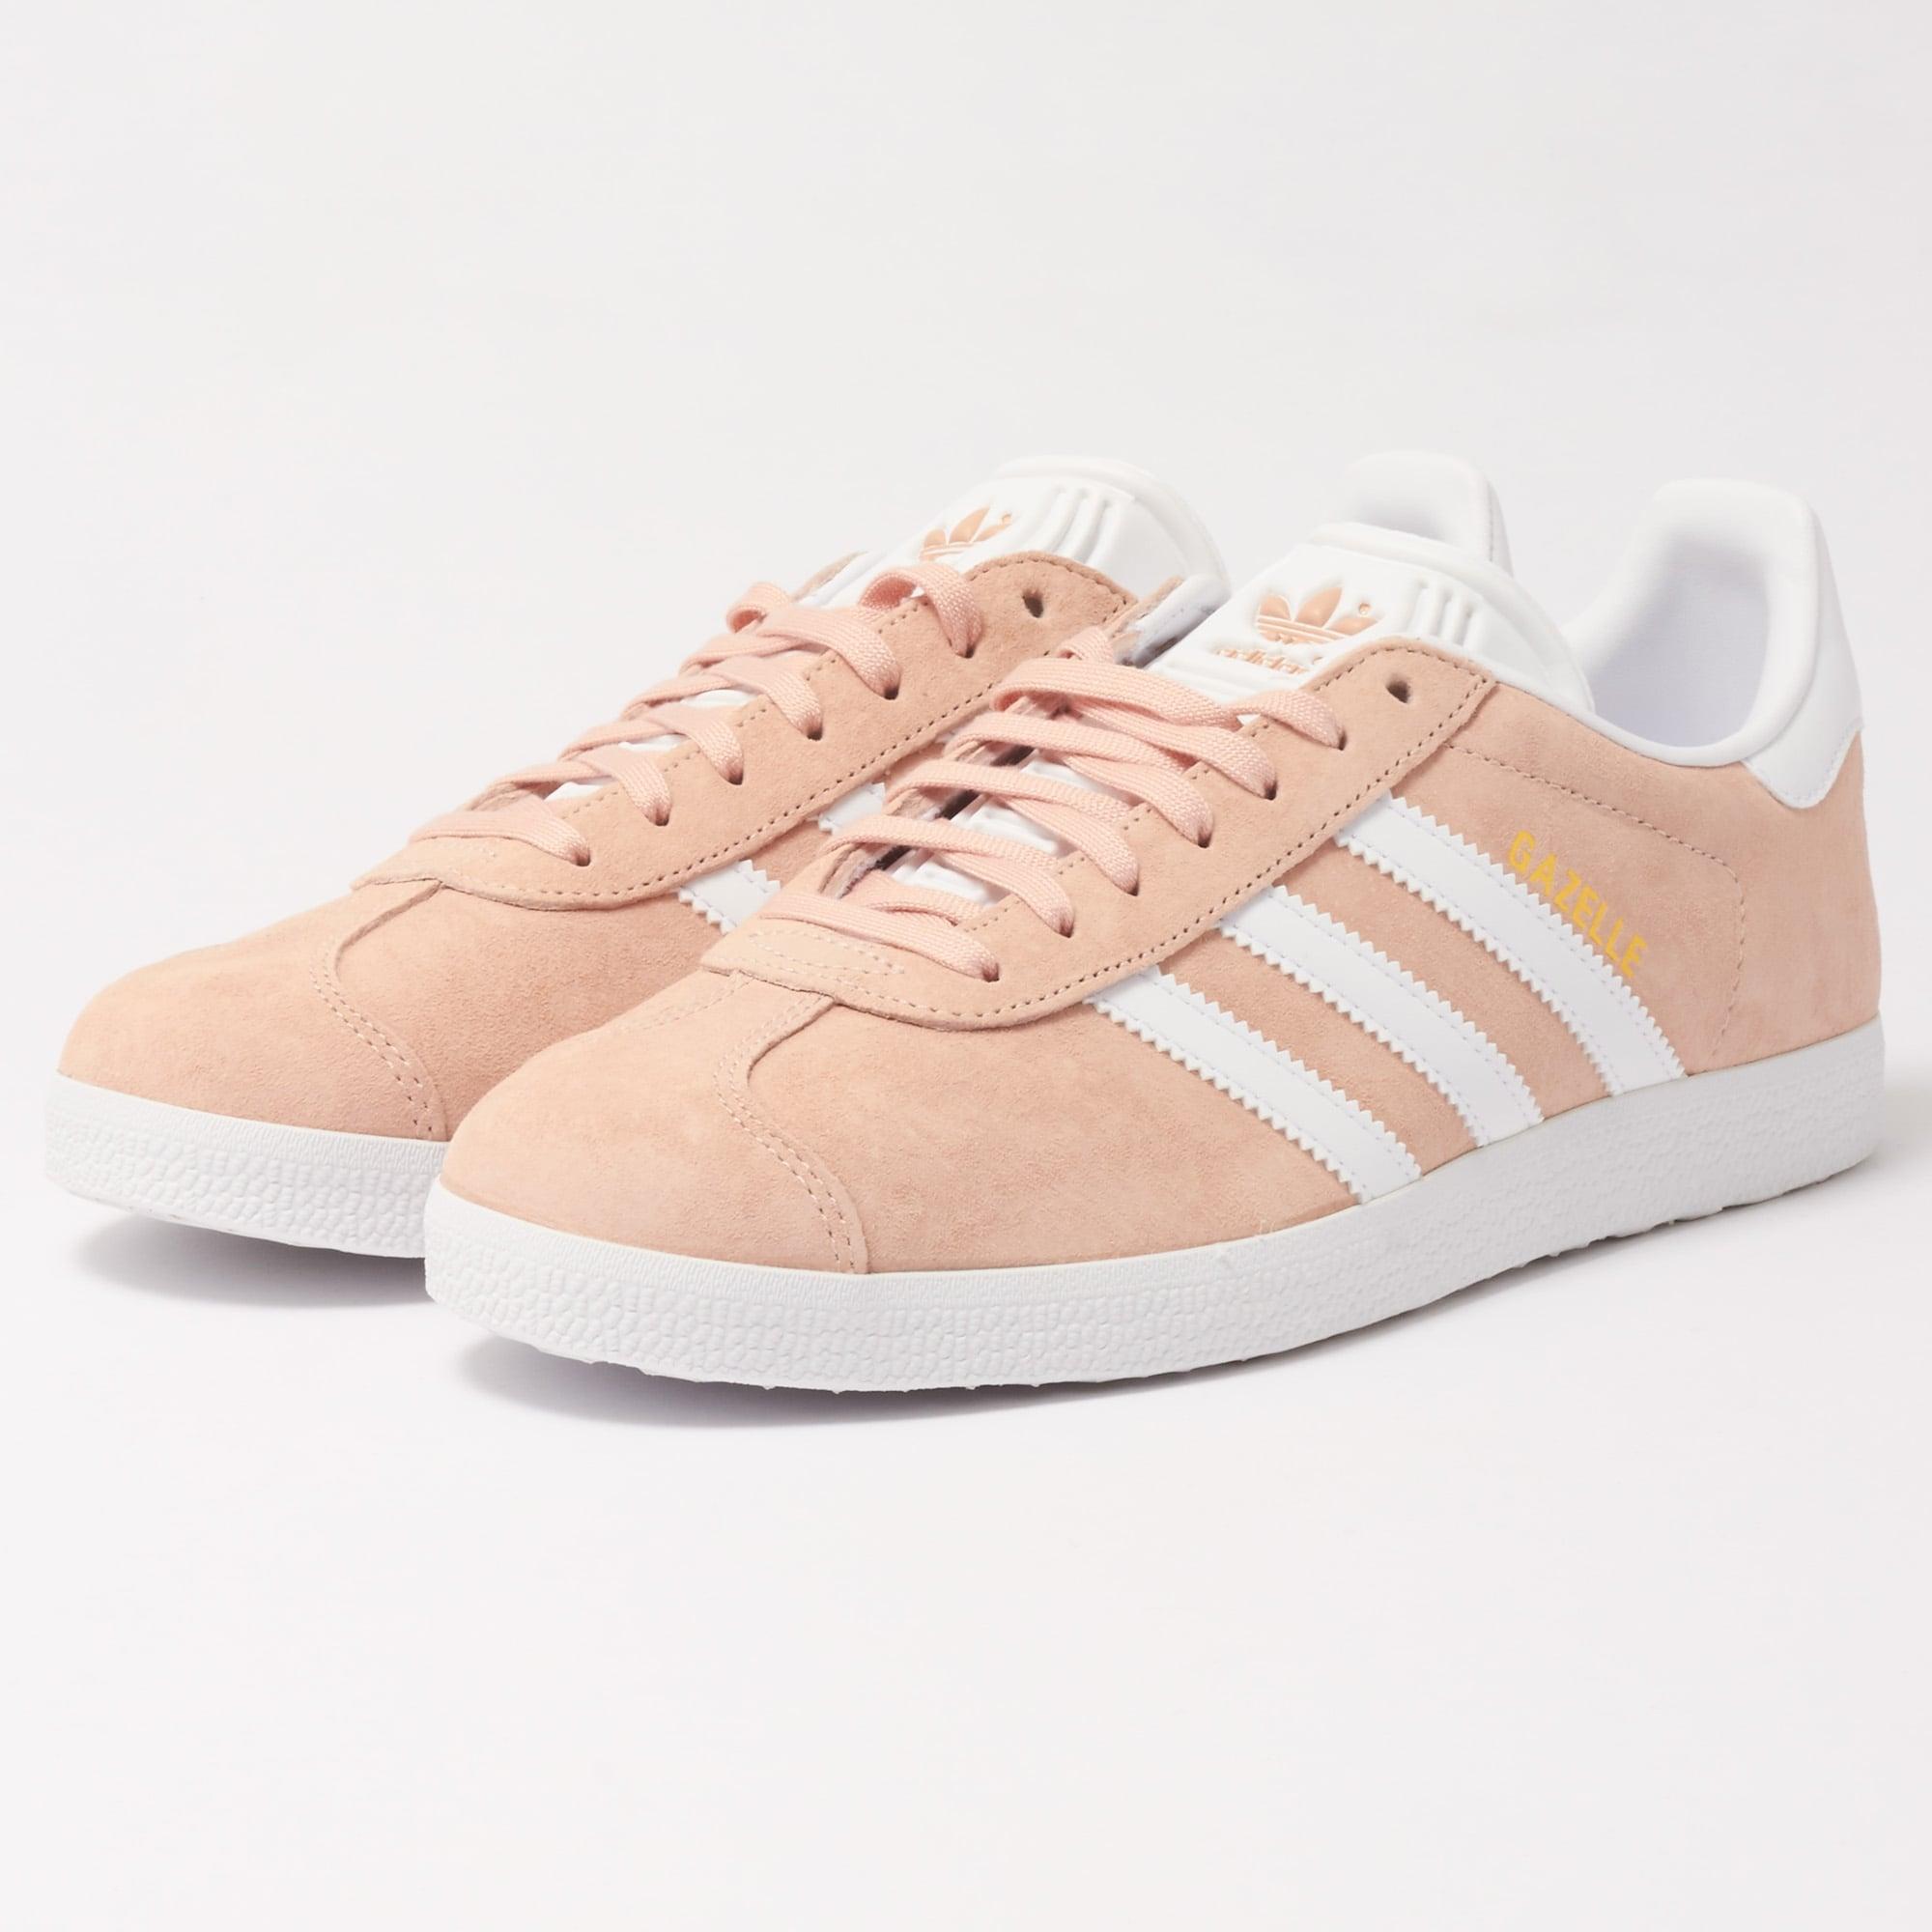 Adidas Footwear  Gazelle Pink Suede Shoe